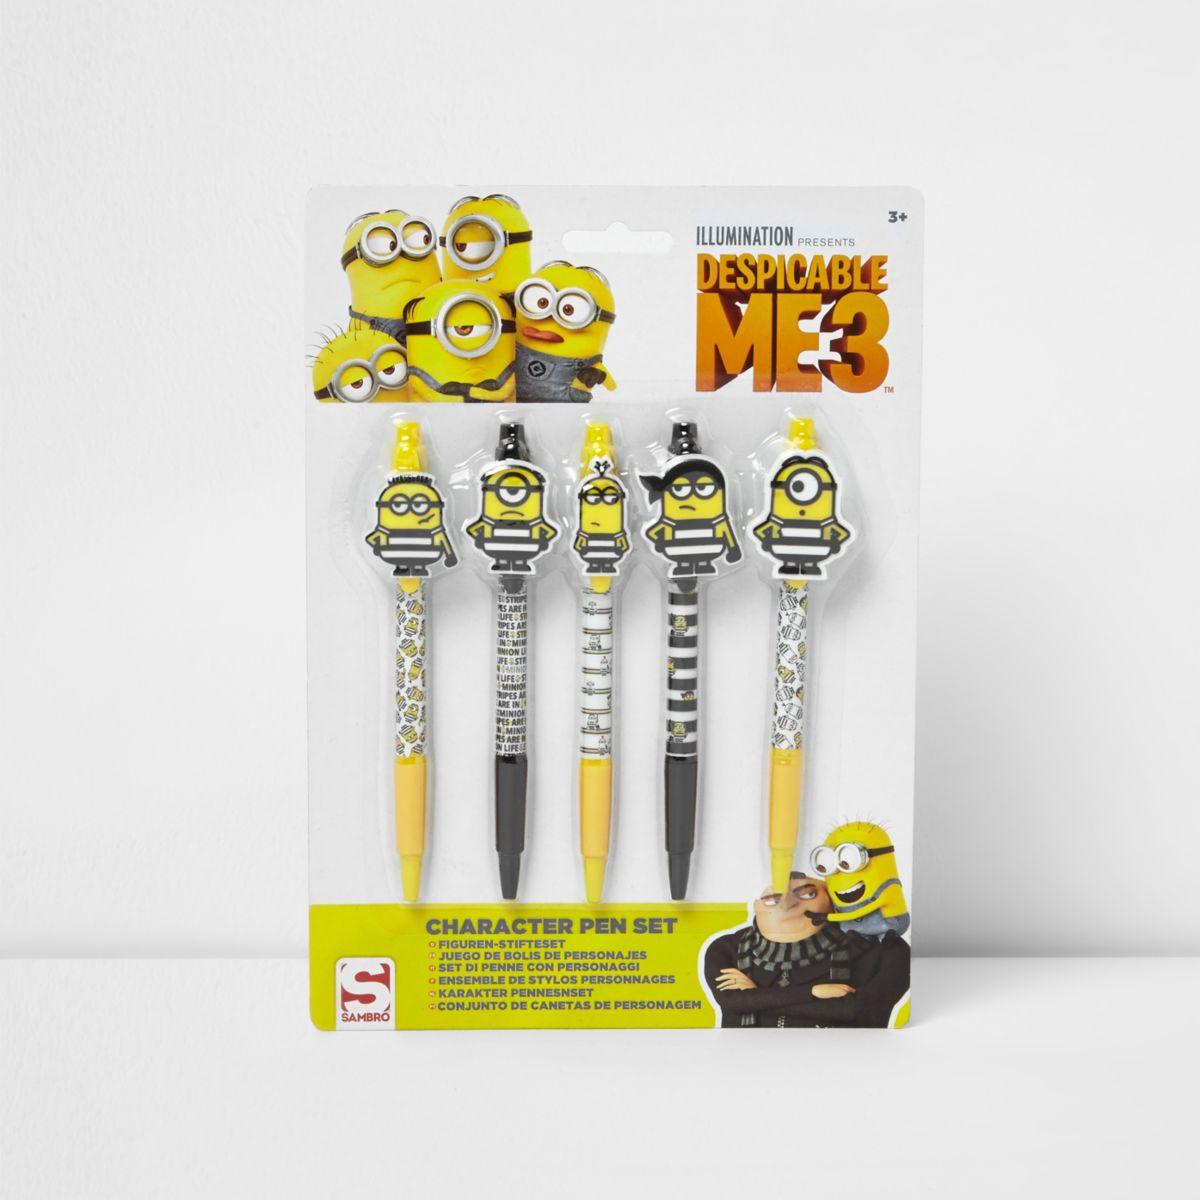 Minions character pen set